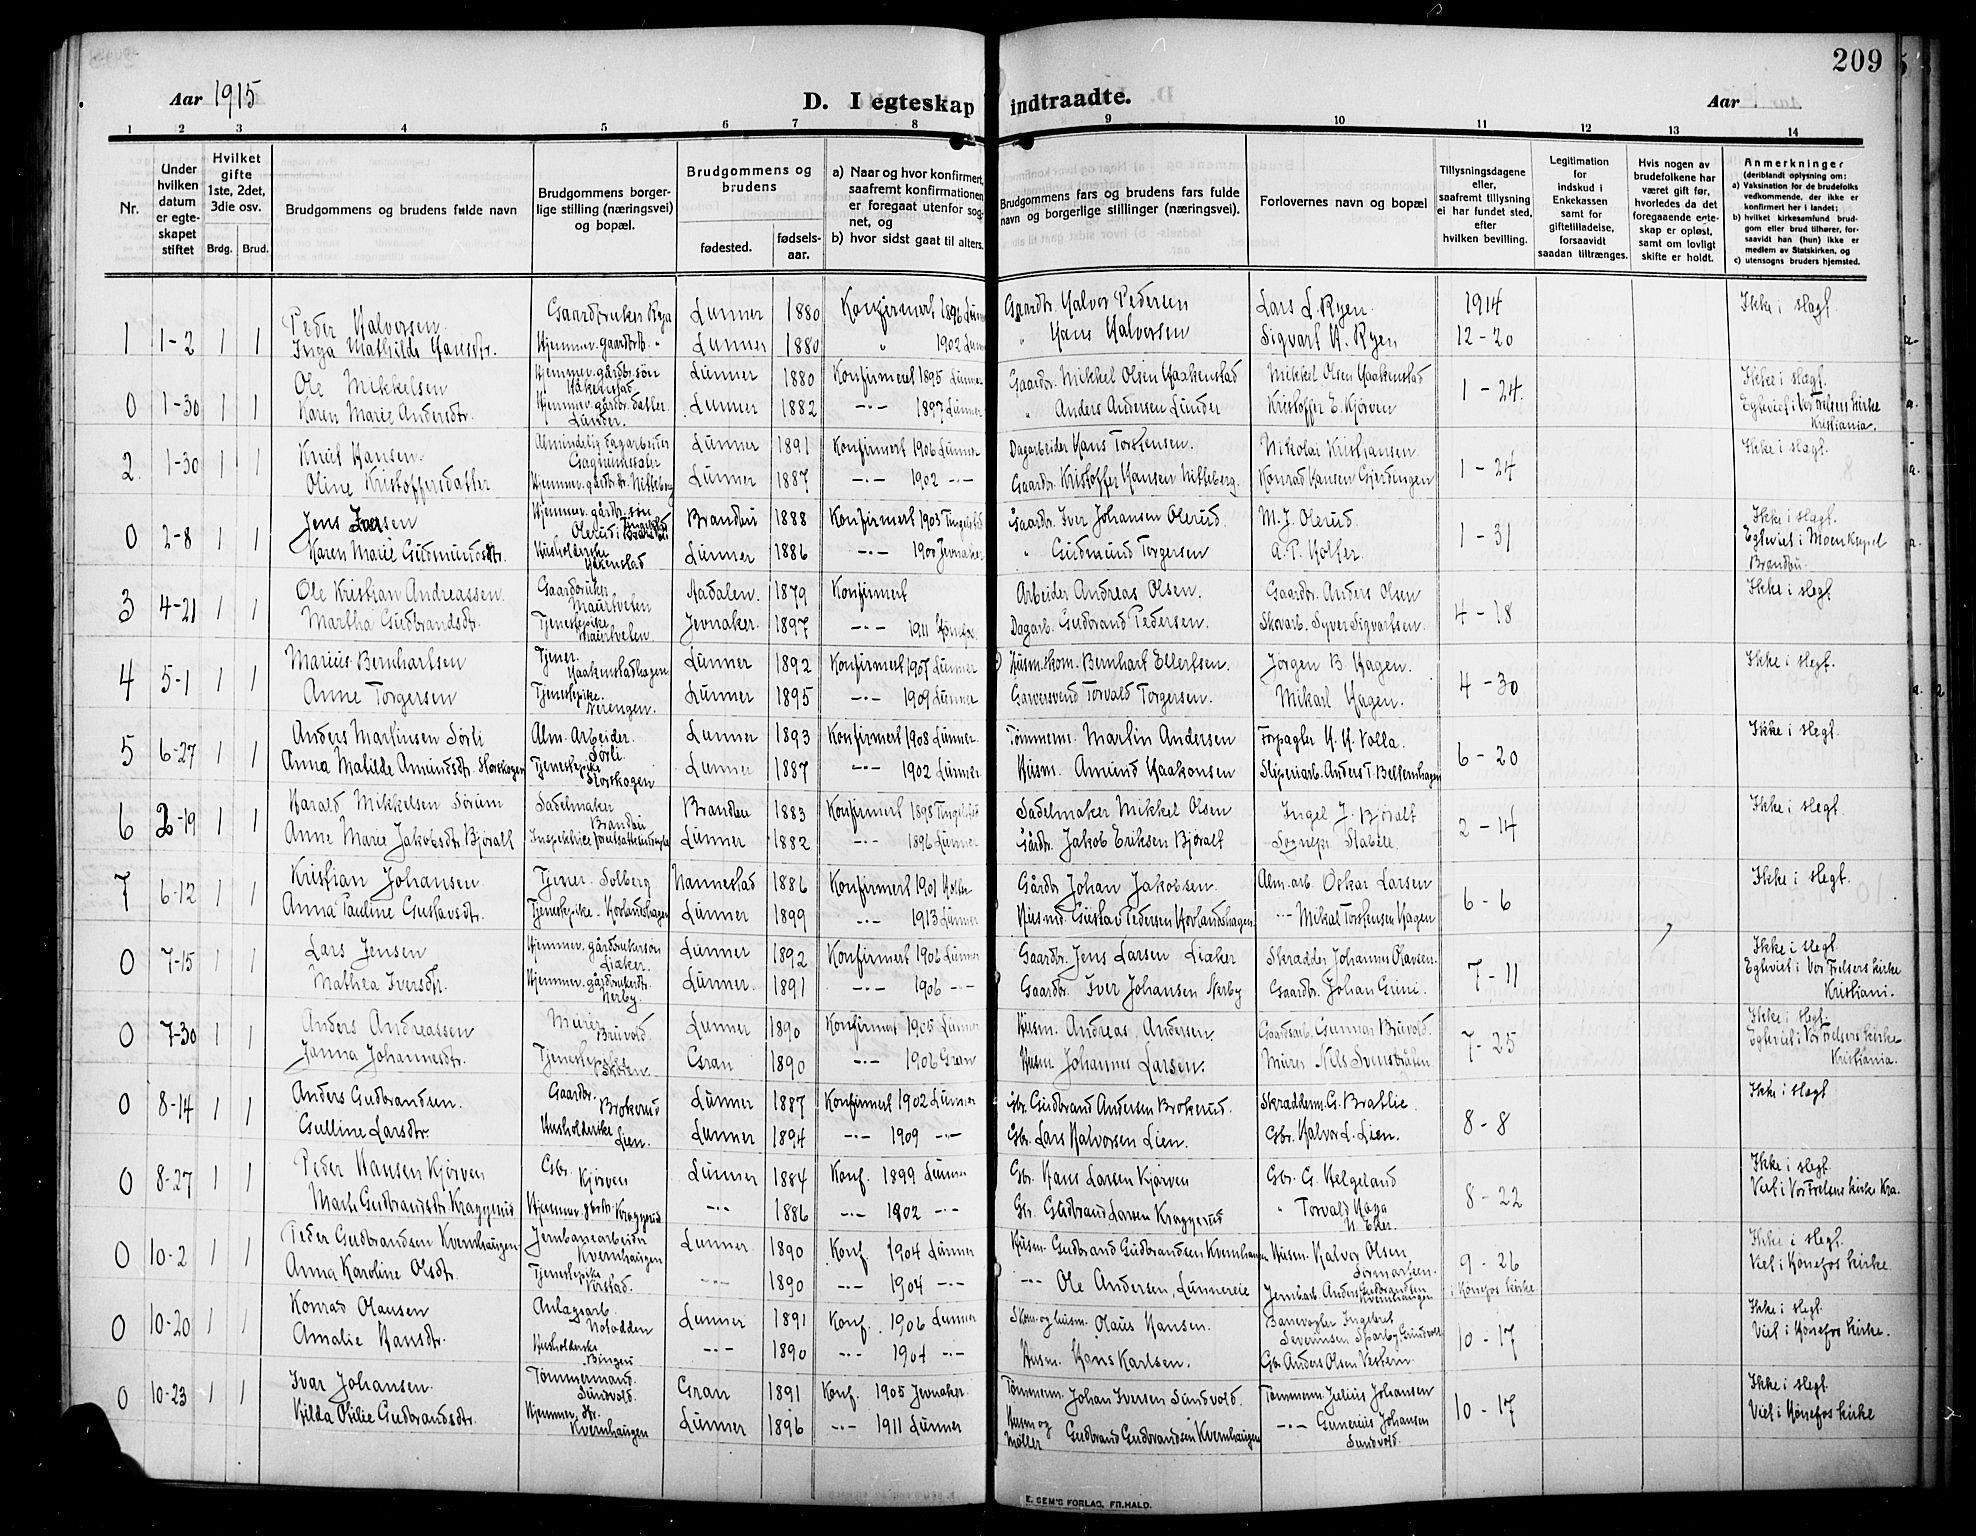 SAH, Lunner prestekontor, H/Ha/Hab/L0001: Klokkerbok nr. 1, 1909-1922, s. 209